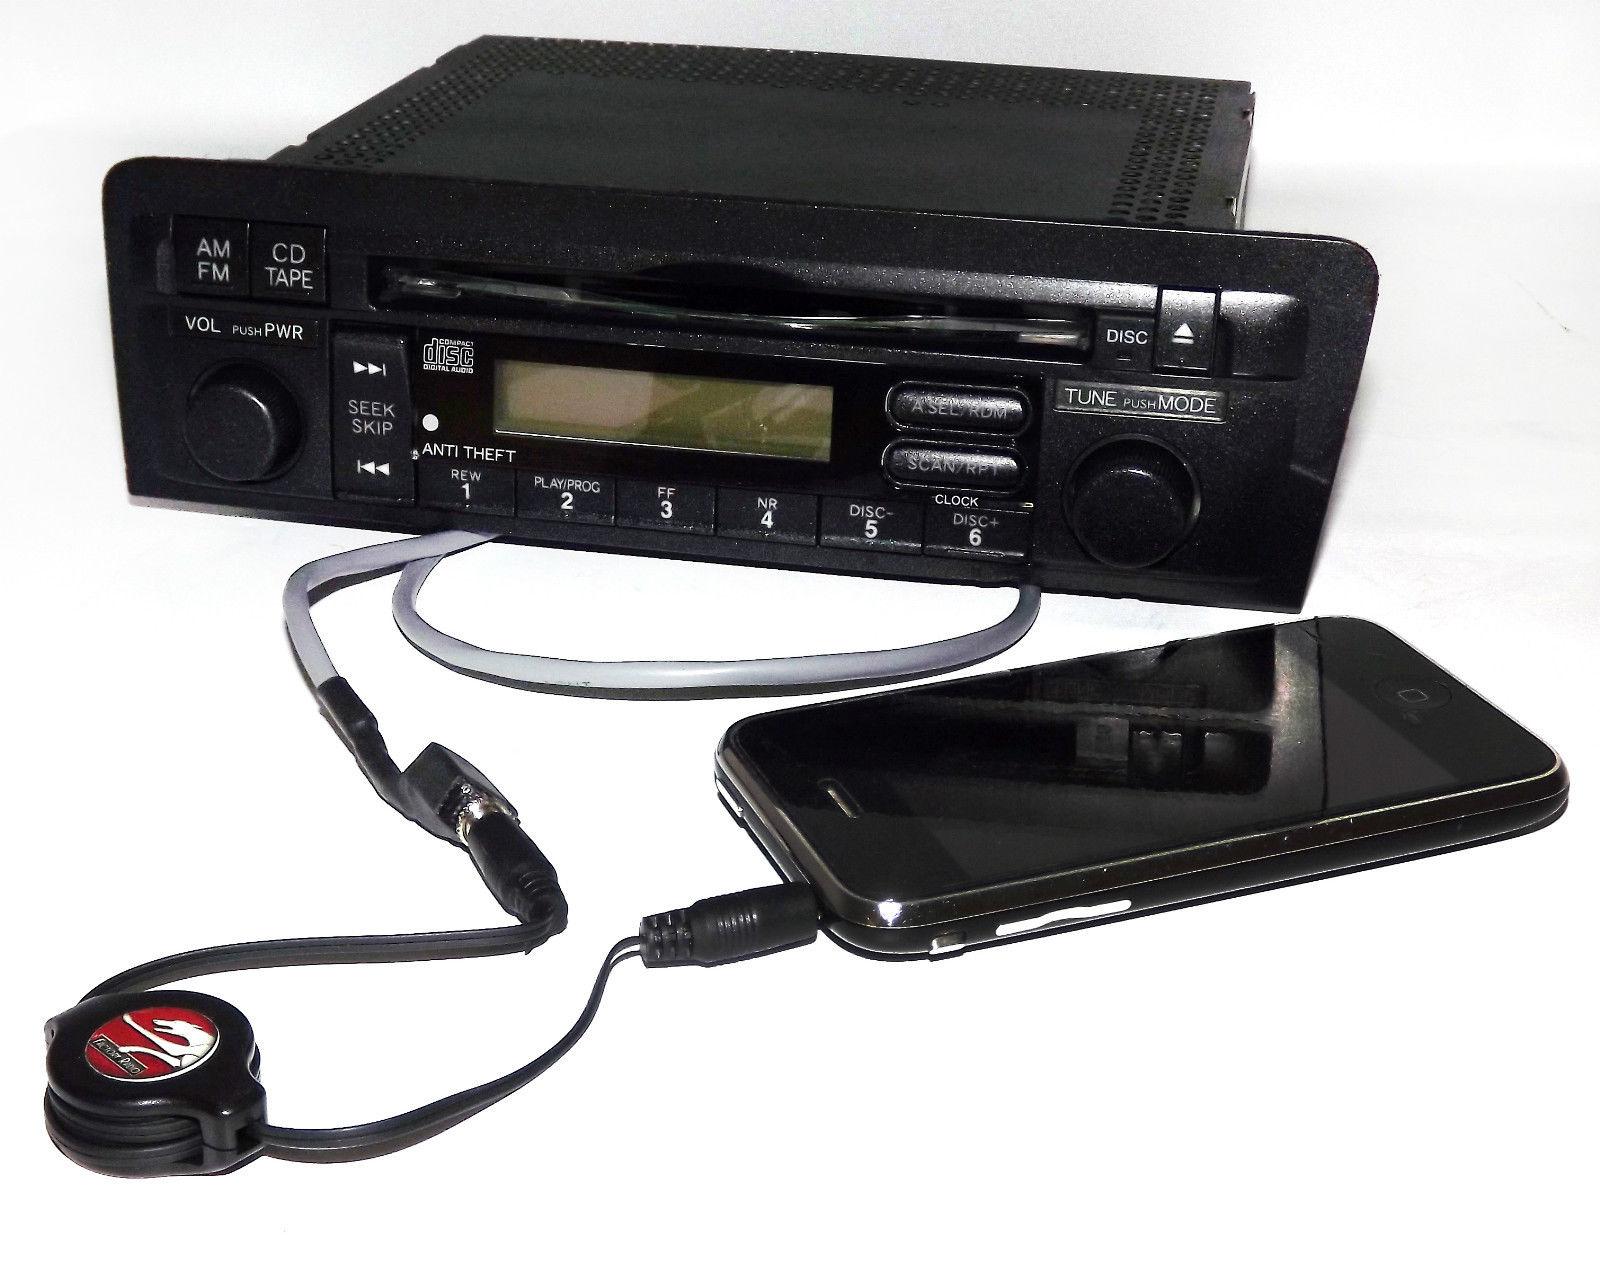 Honda Civic 2001 2003 Radio Am Fm Cd Aux Input W Code Part 39101 1988 Fuse Box S5a A610 M1 1 Factory